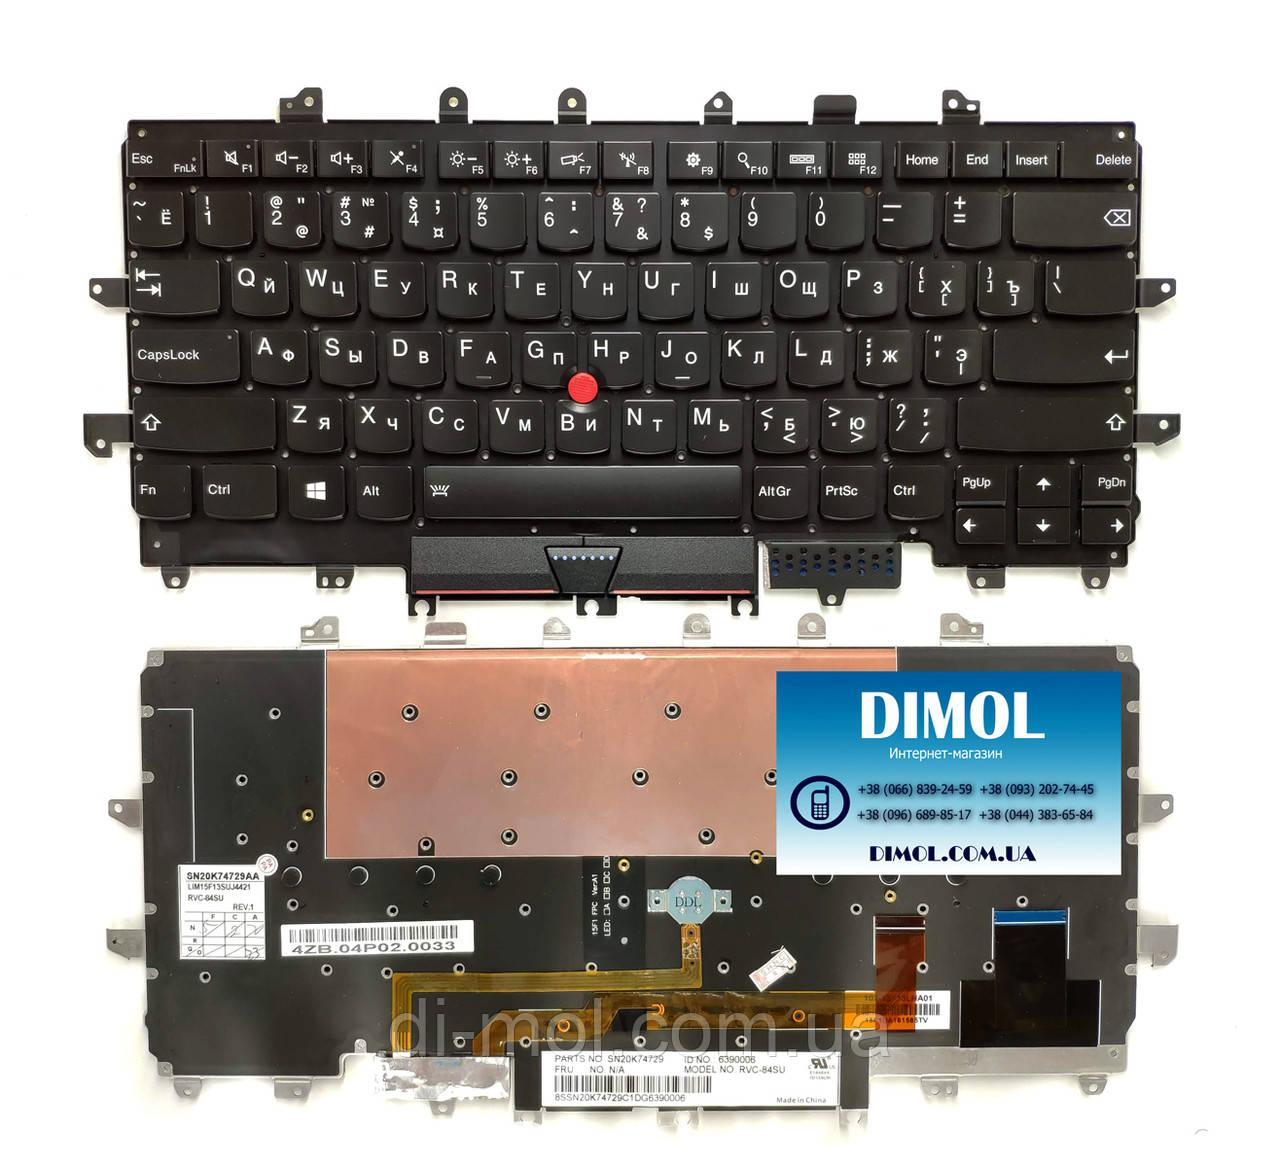 Оригинальная клавиатура для ноутбука Lenovo Thinkpad X1 Carbon Gen 4 series, ru, black, подсветка